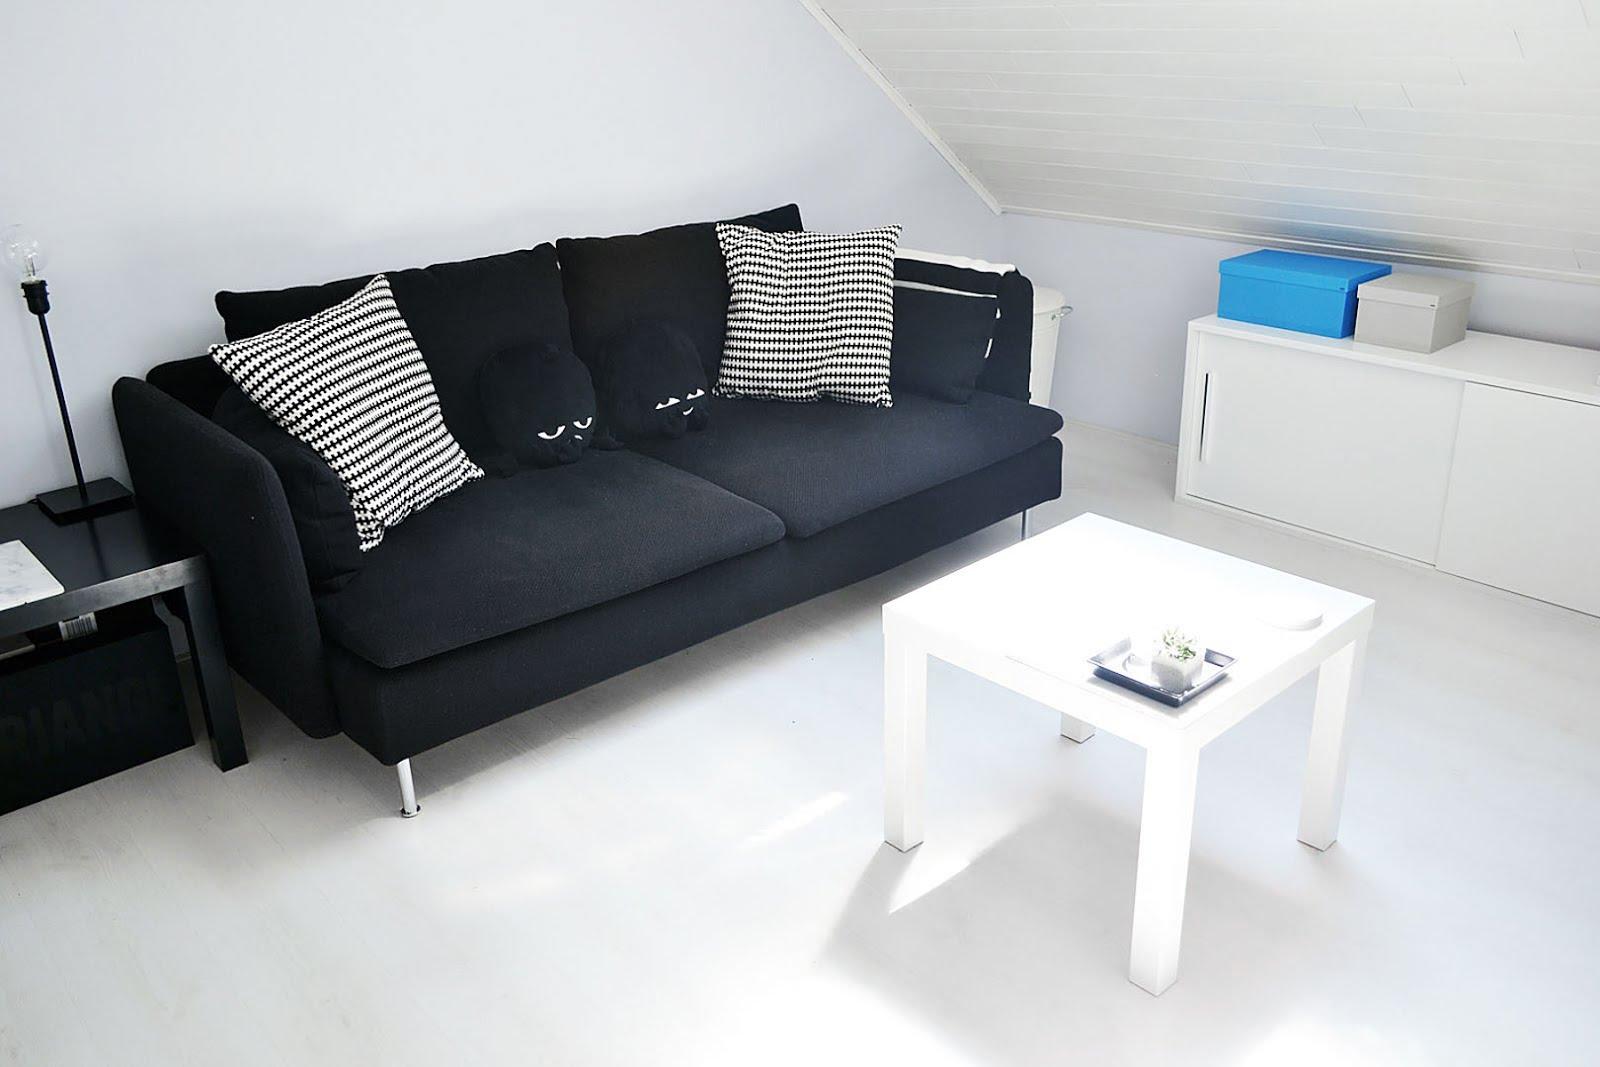 IKEA soderhamn, black cover, ikea lack table white, monkis, animals, black sofa,